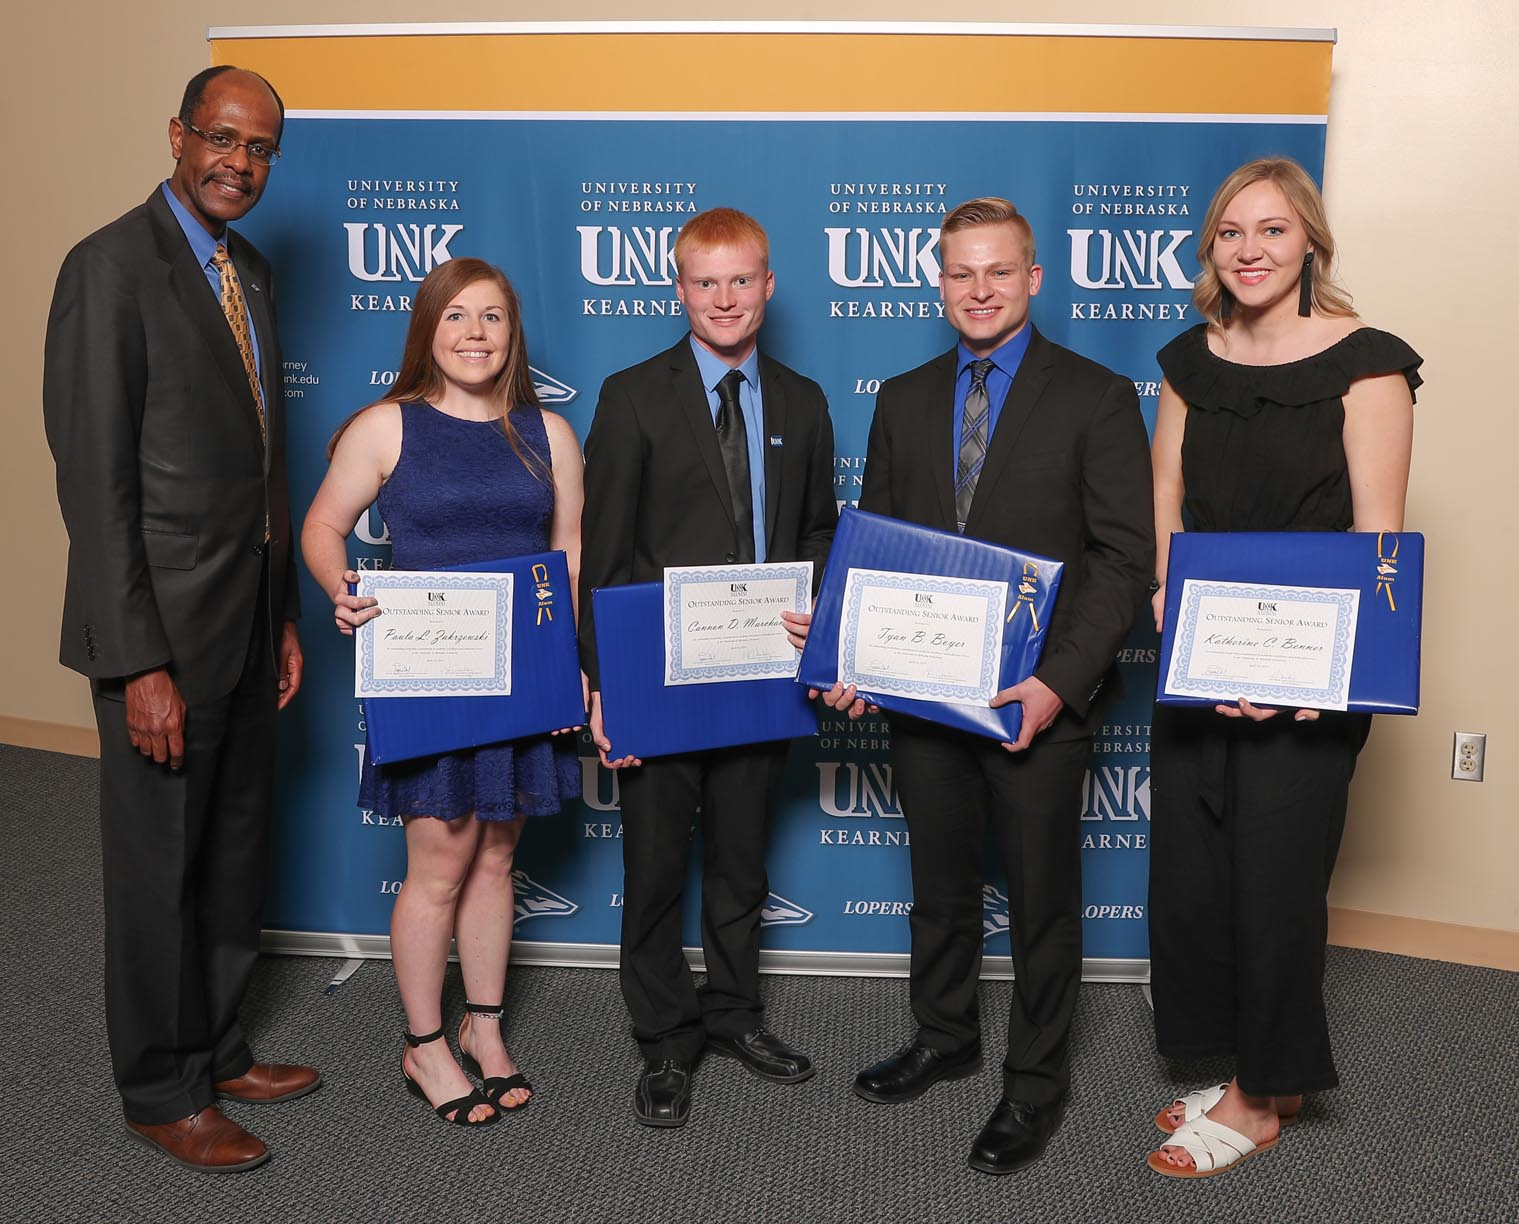 Outstanding Senior Awards - Paula Zakrzewski, Cannon Marchand, Tyan Boyer, Katie Benner